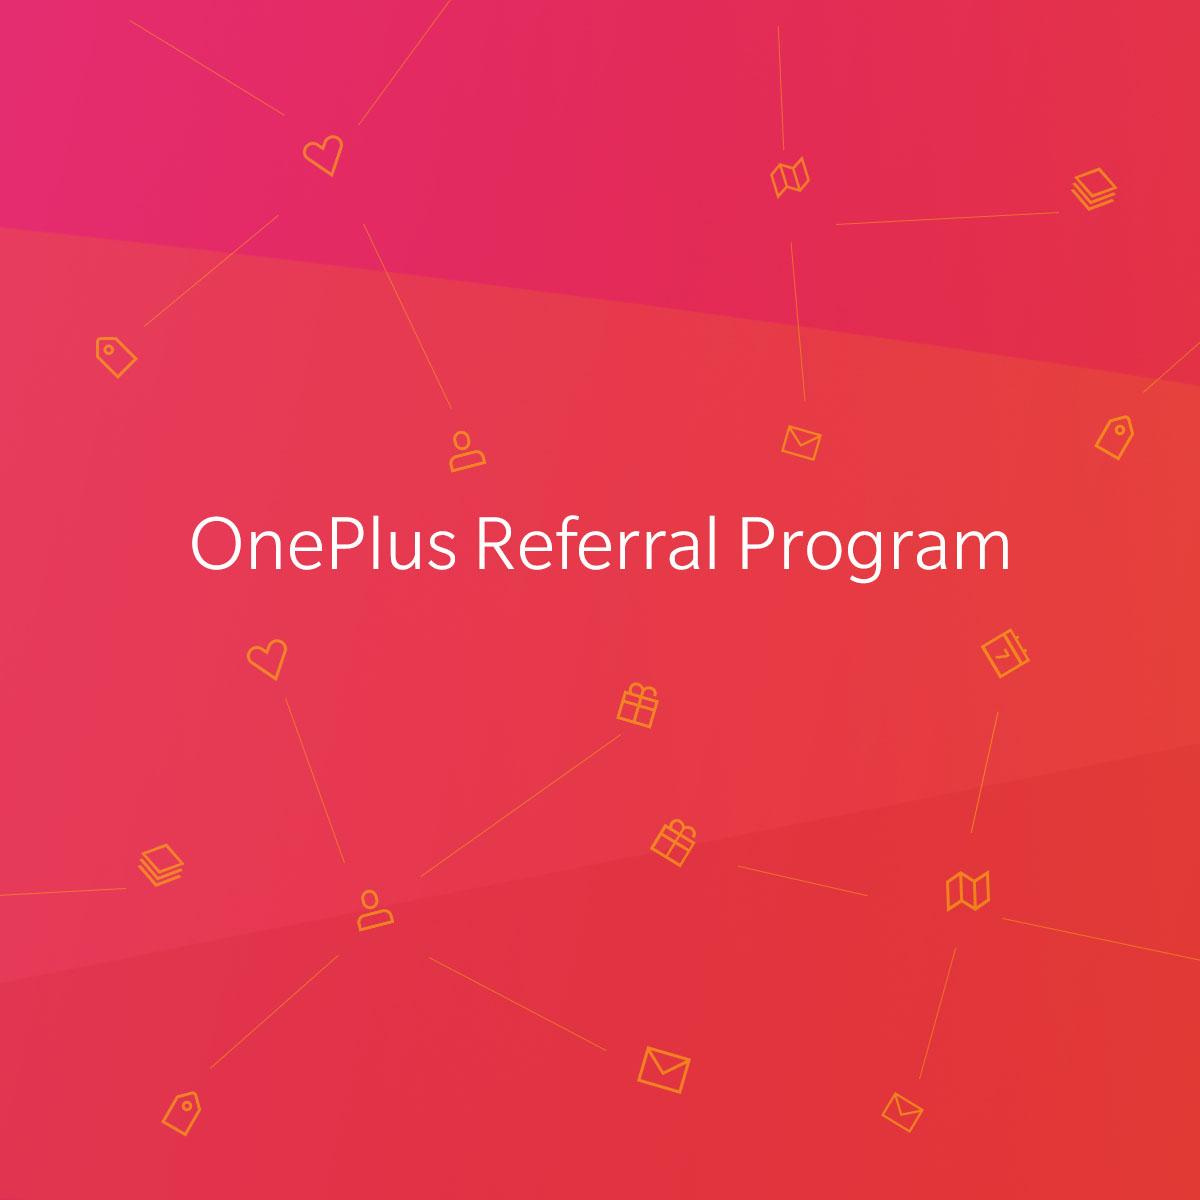 Referral Program - OnePlus (India)